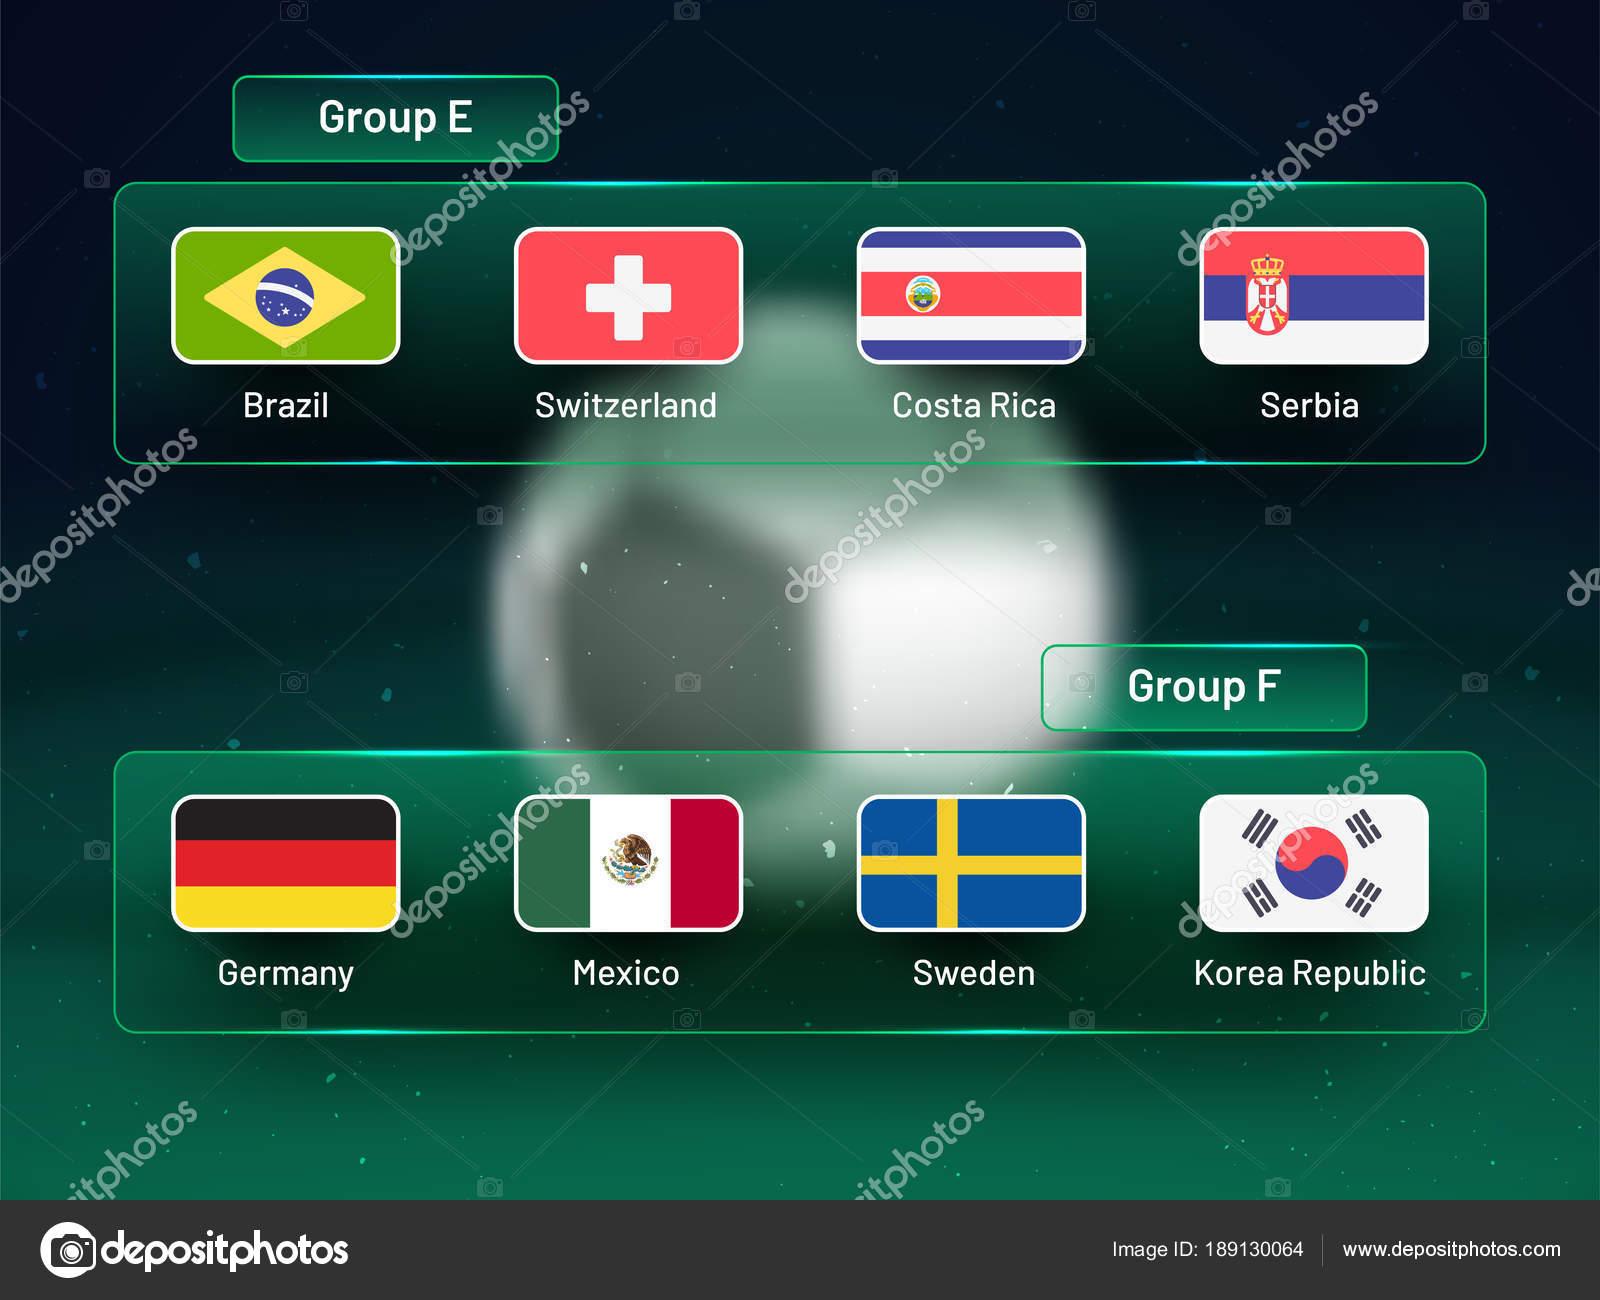 Cool Final World Cup 2018 - depositphotos_189130064-stock-illustration-russia-2018-world-cup-calendar  Collection_864899 .jpg